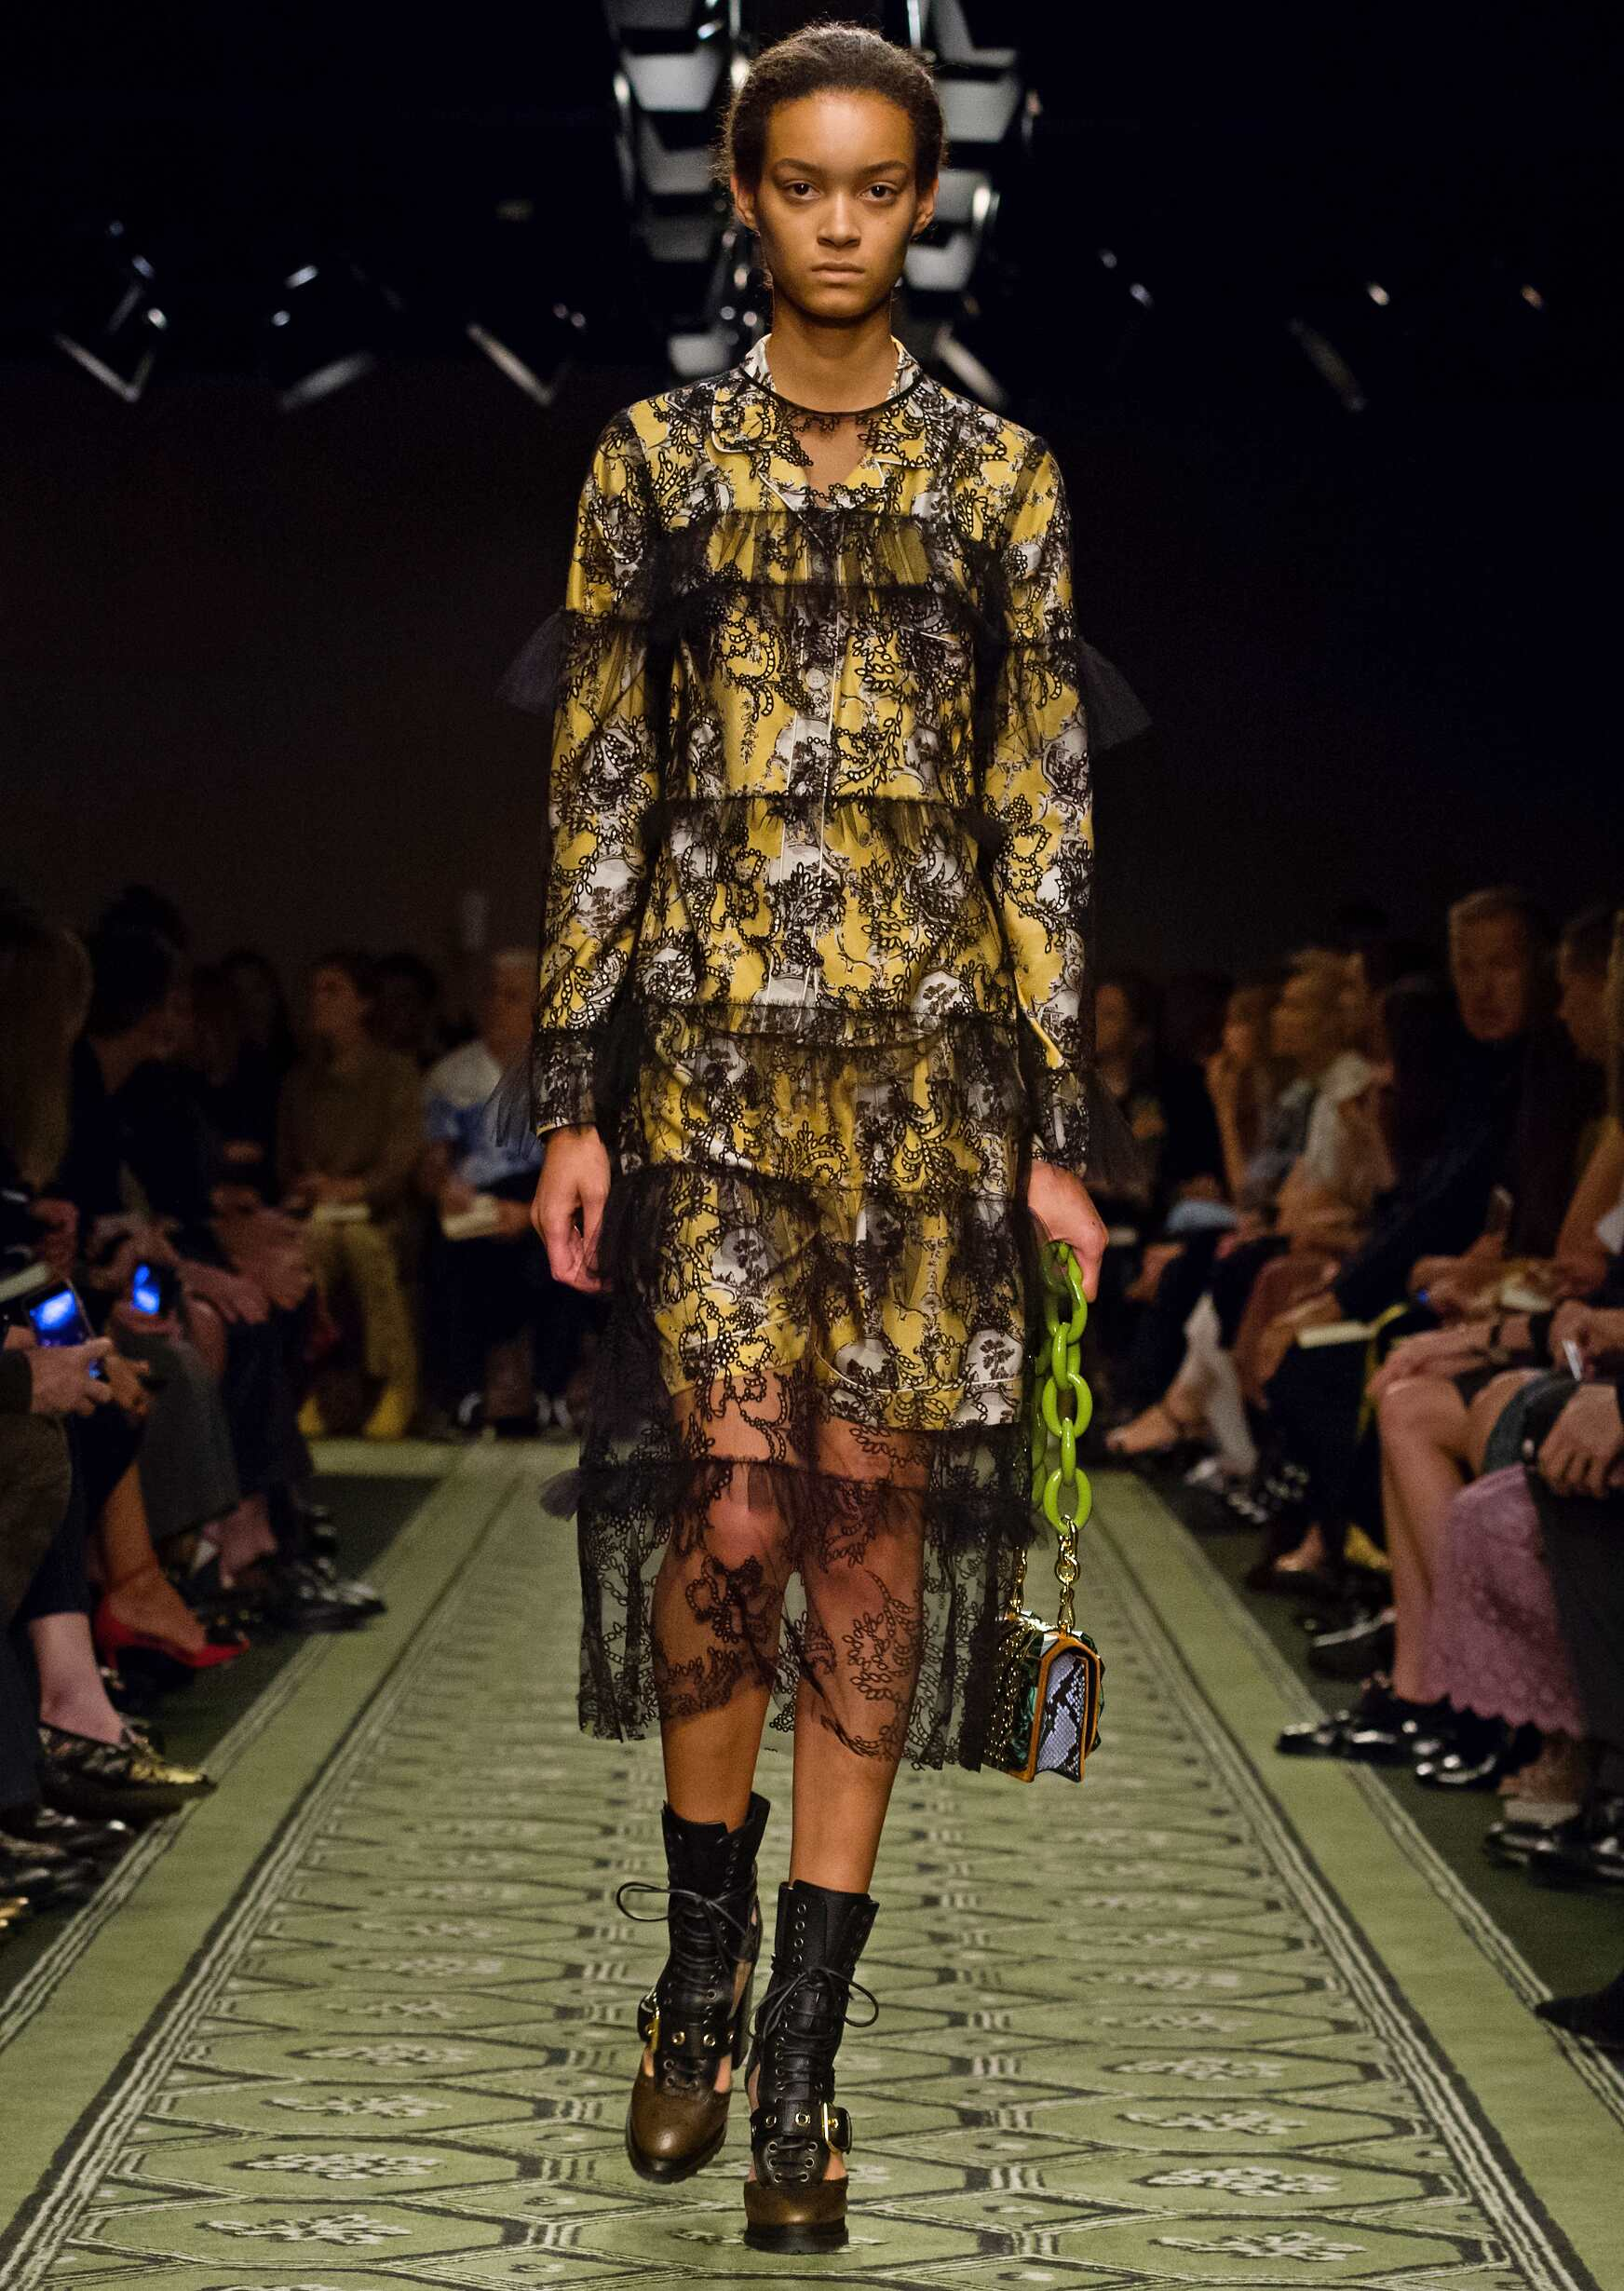 Catwalk Burberry Woman Fashion Show 2016 London Fashion Week